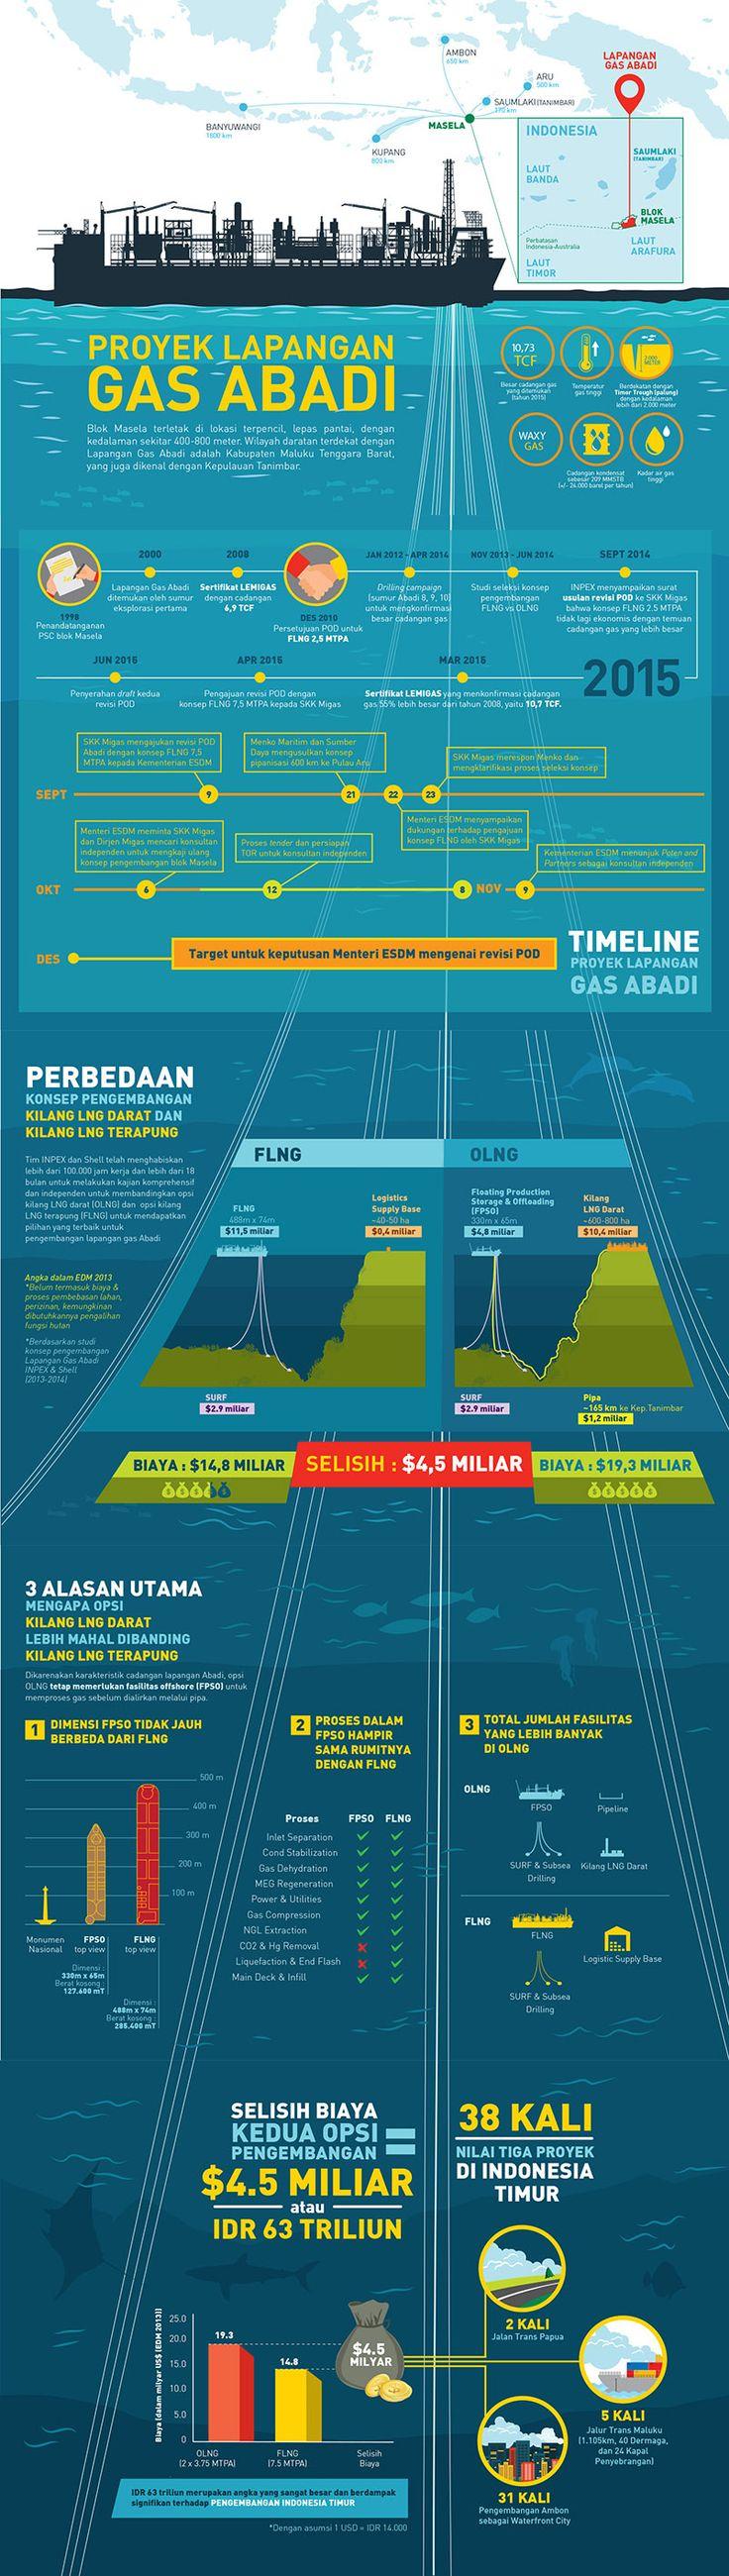 #FLNG #OLNG #mining #technology #migas #teknologi #indonesia #innovation #energy #enginering #engineering #maritime #maritim #LNG #resource #infographic #sea #vessel #boat #shipyard